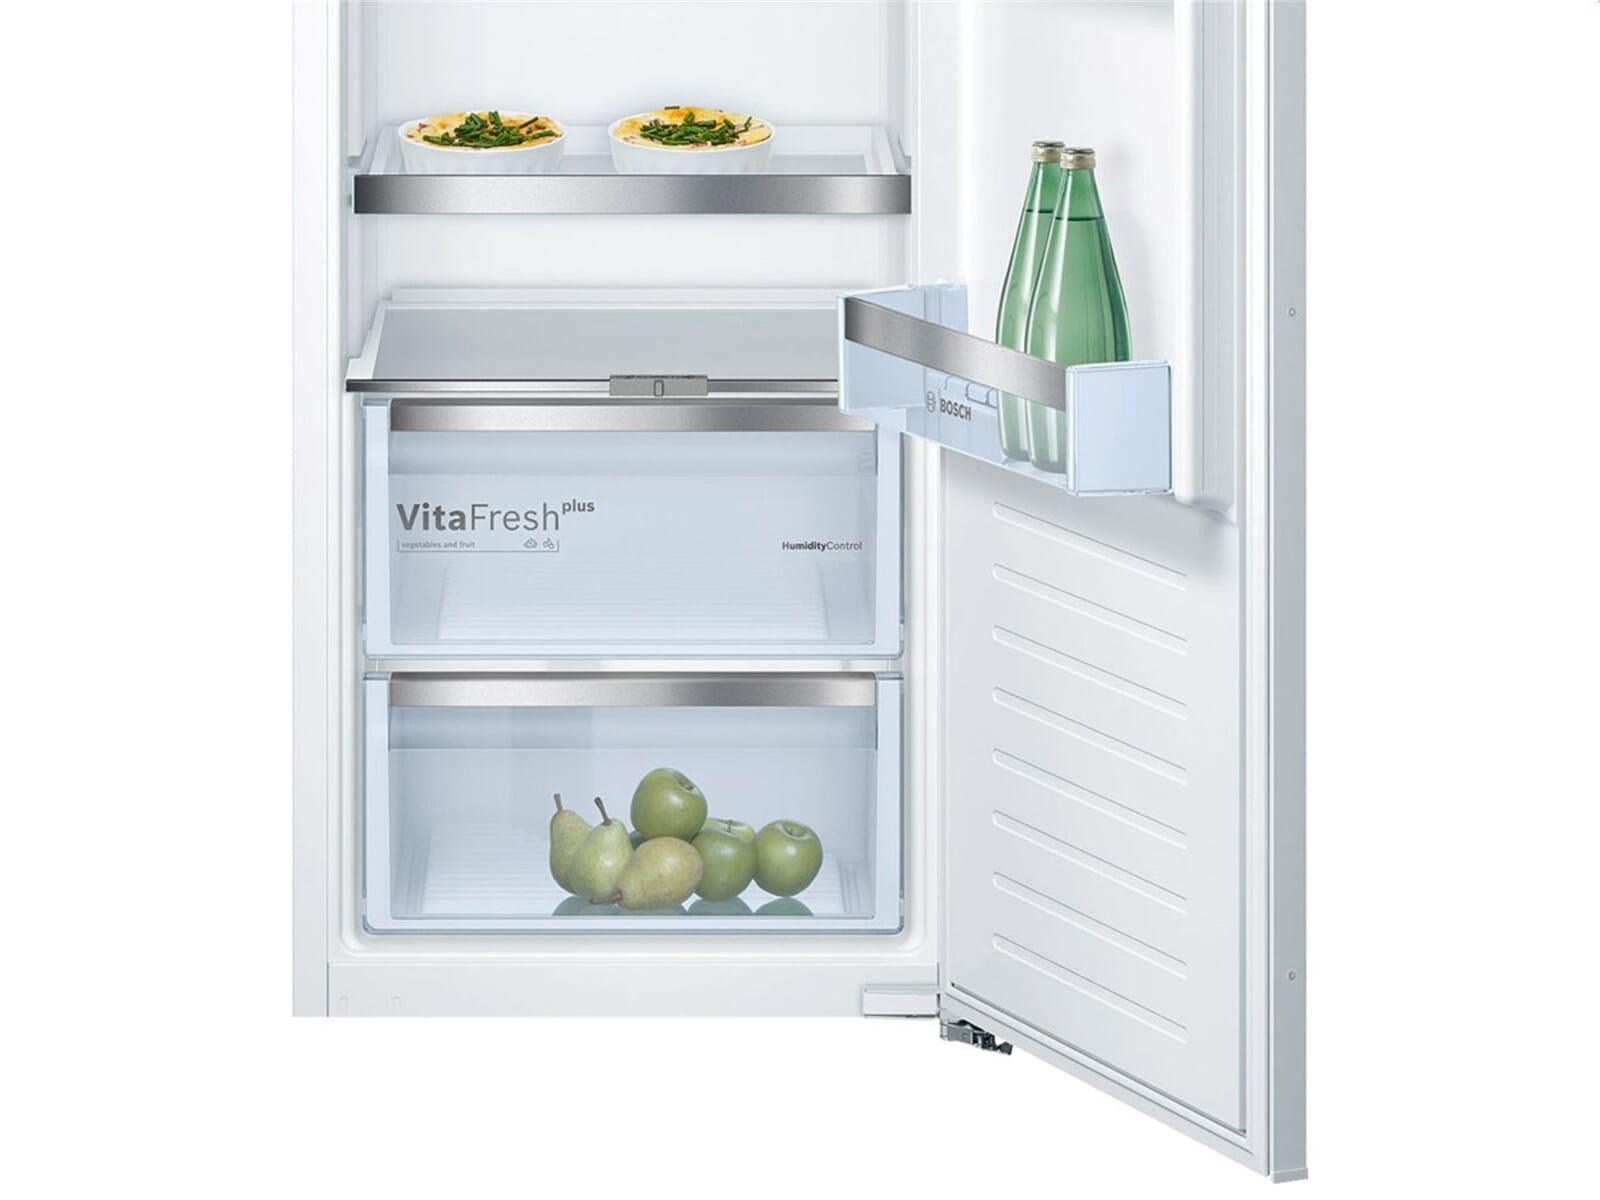 Bosch Kühlschrank Biofresh : Bosch kir af einbaukühlschrank